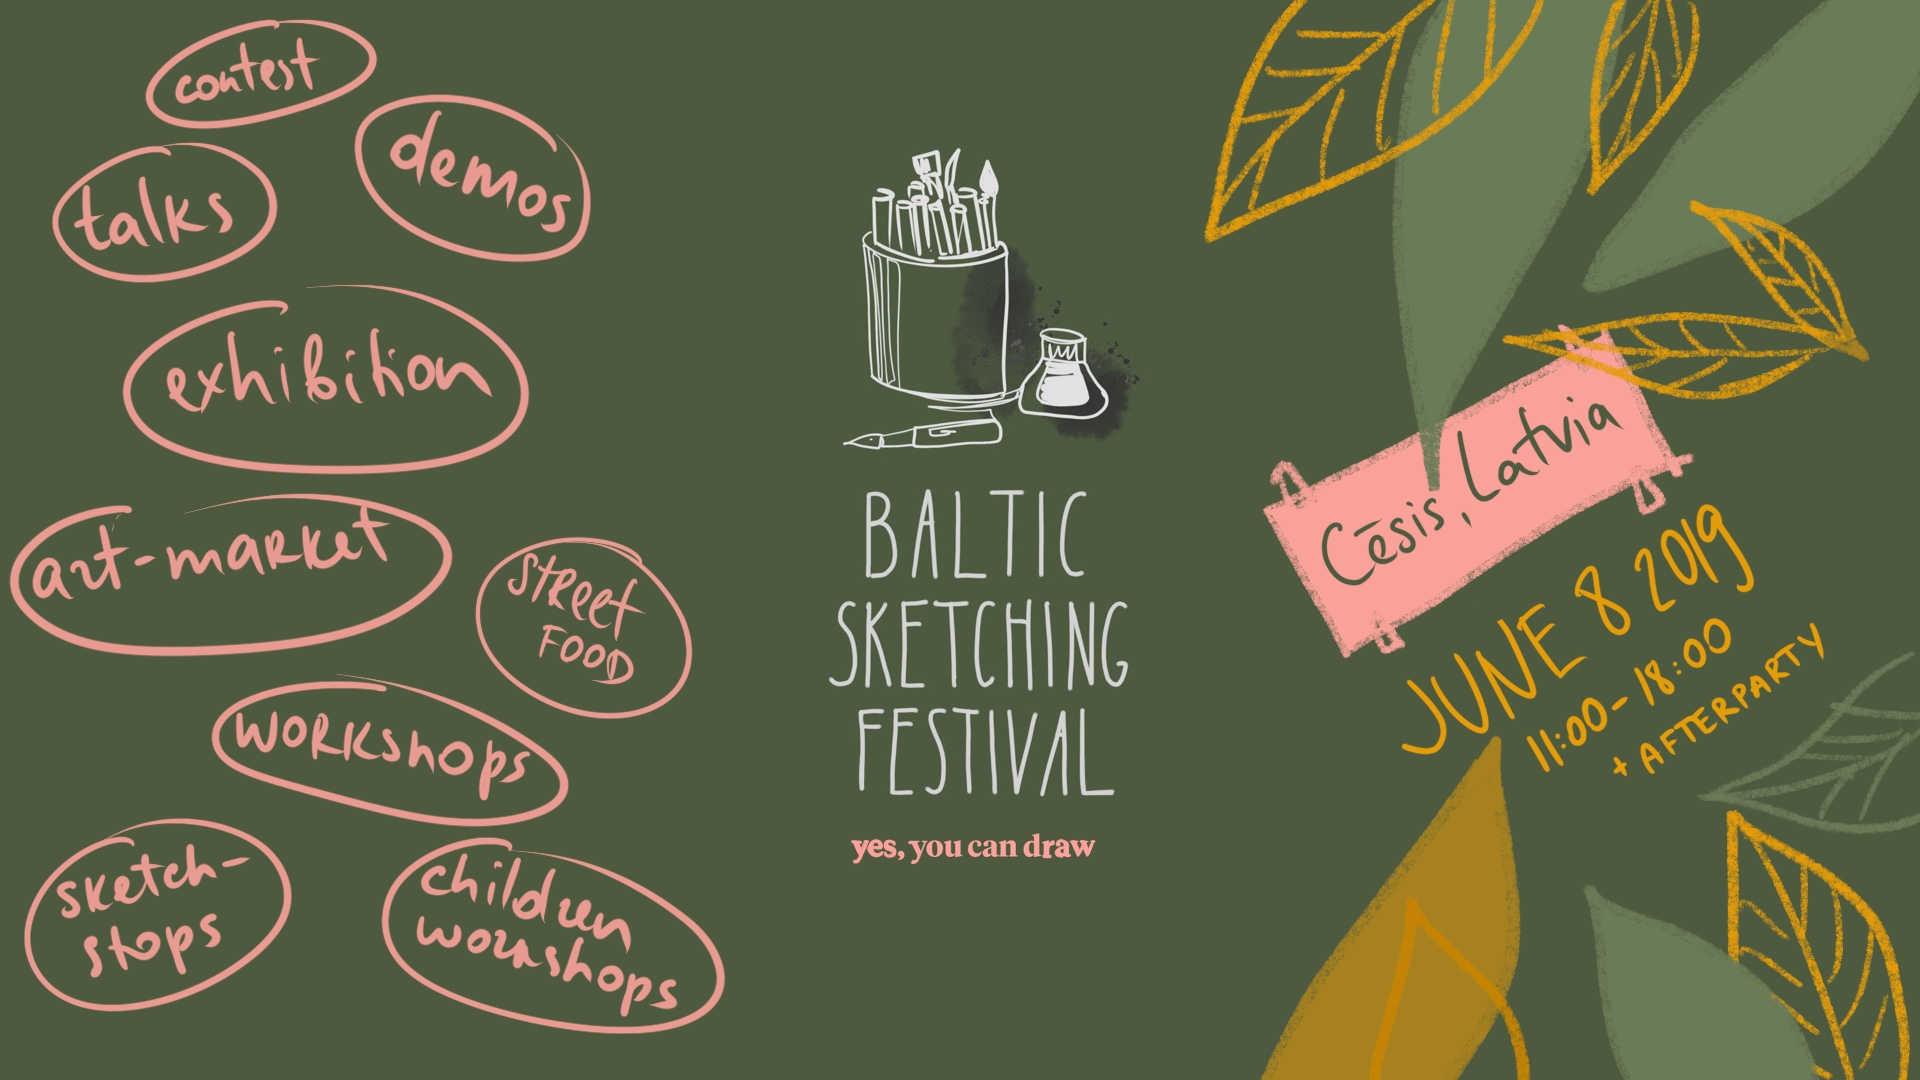 Baltic Sketching Festival 2019